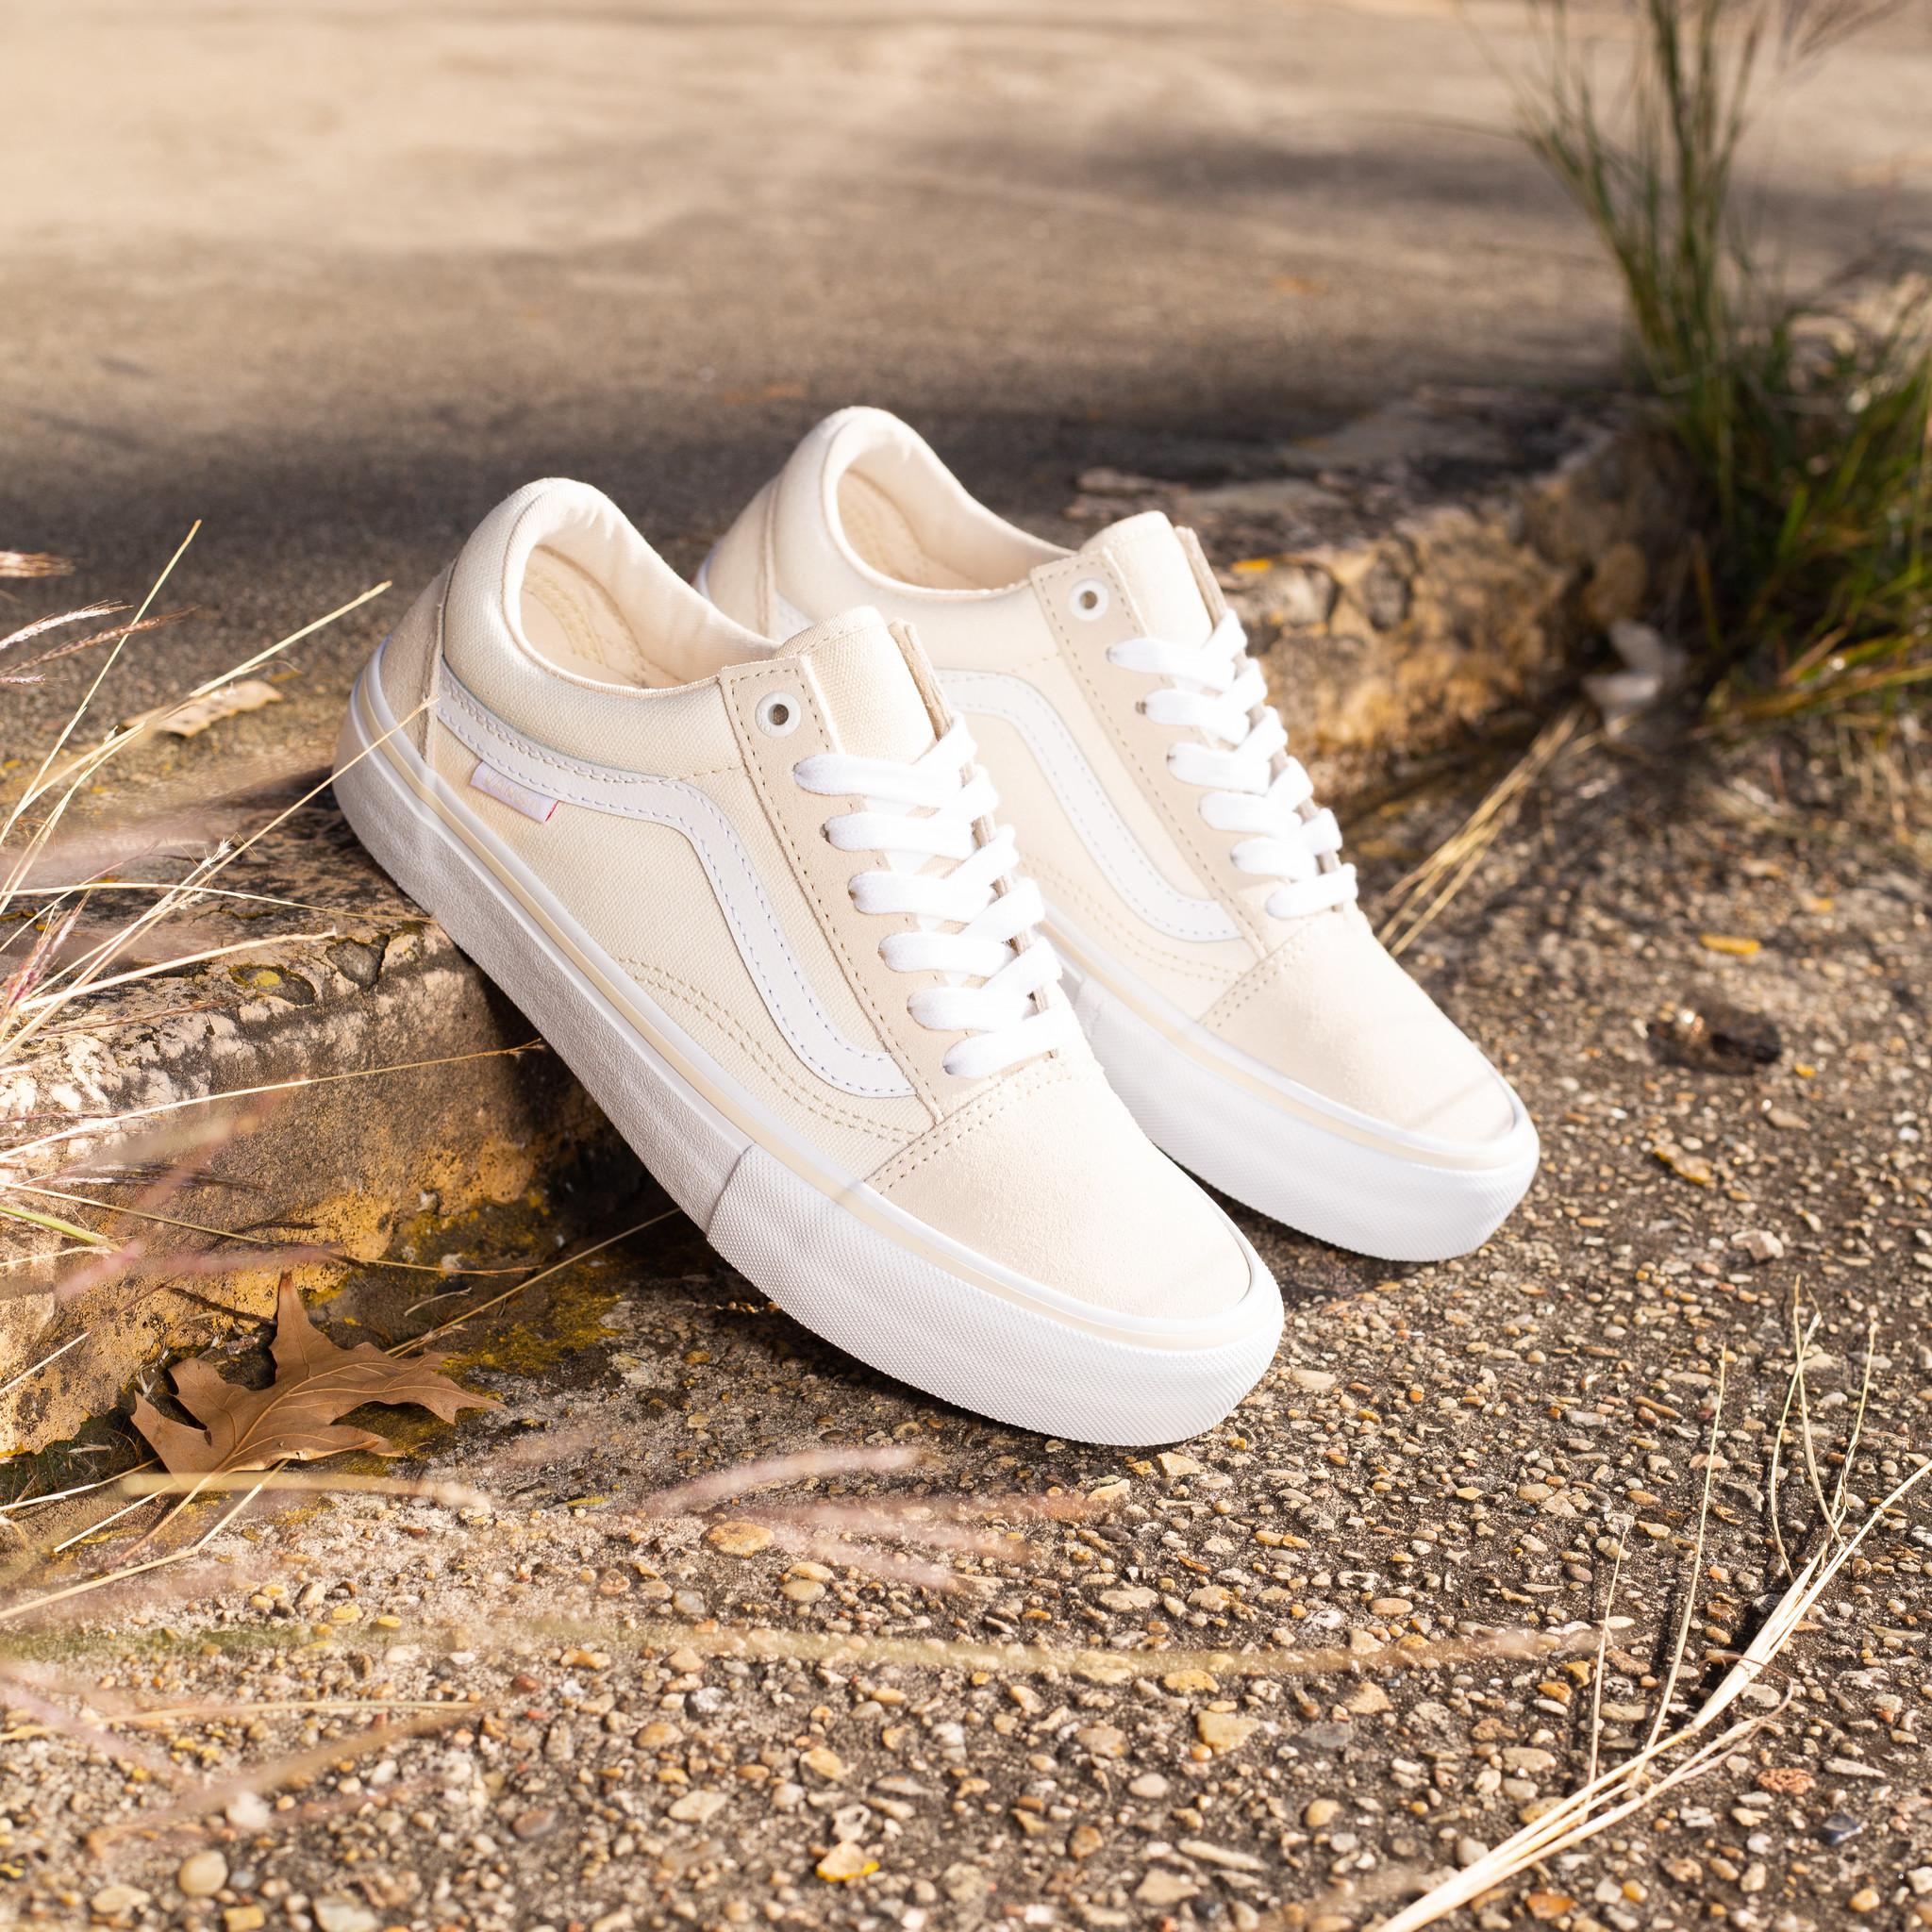 Vans Old Skool Pro Marshmallow/White